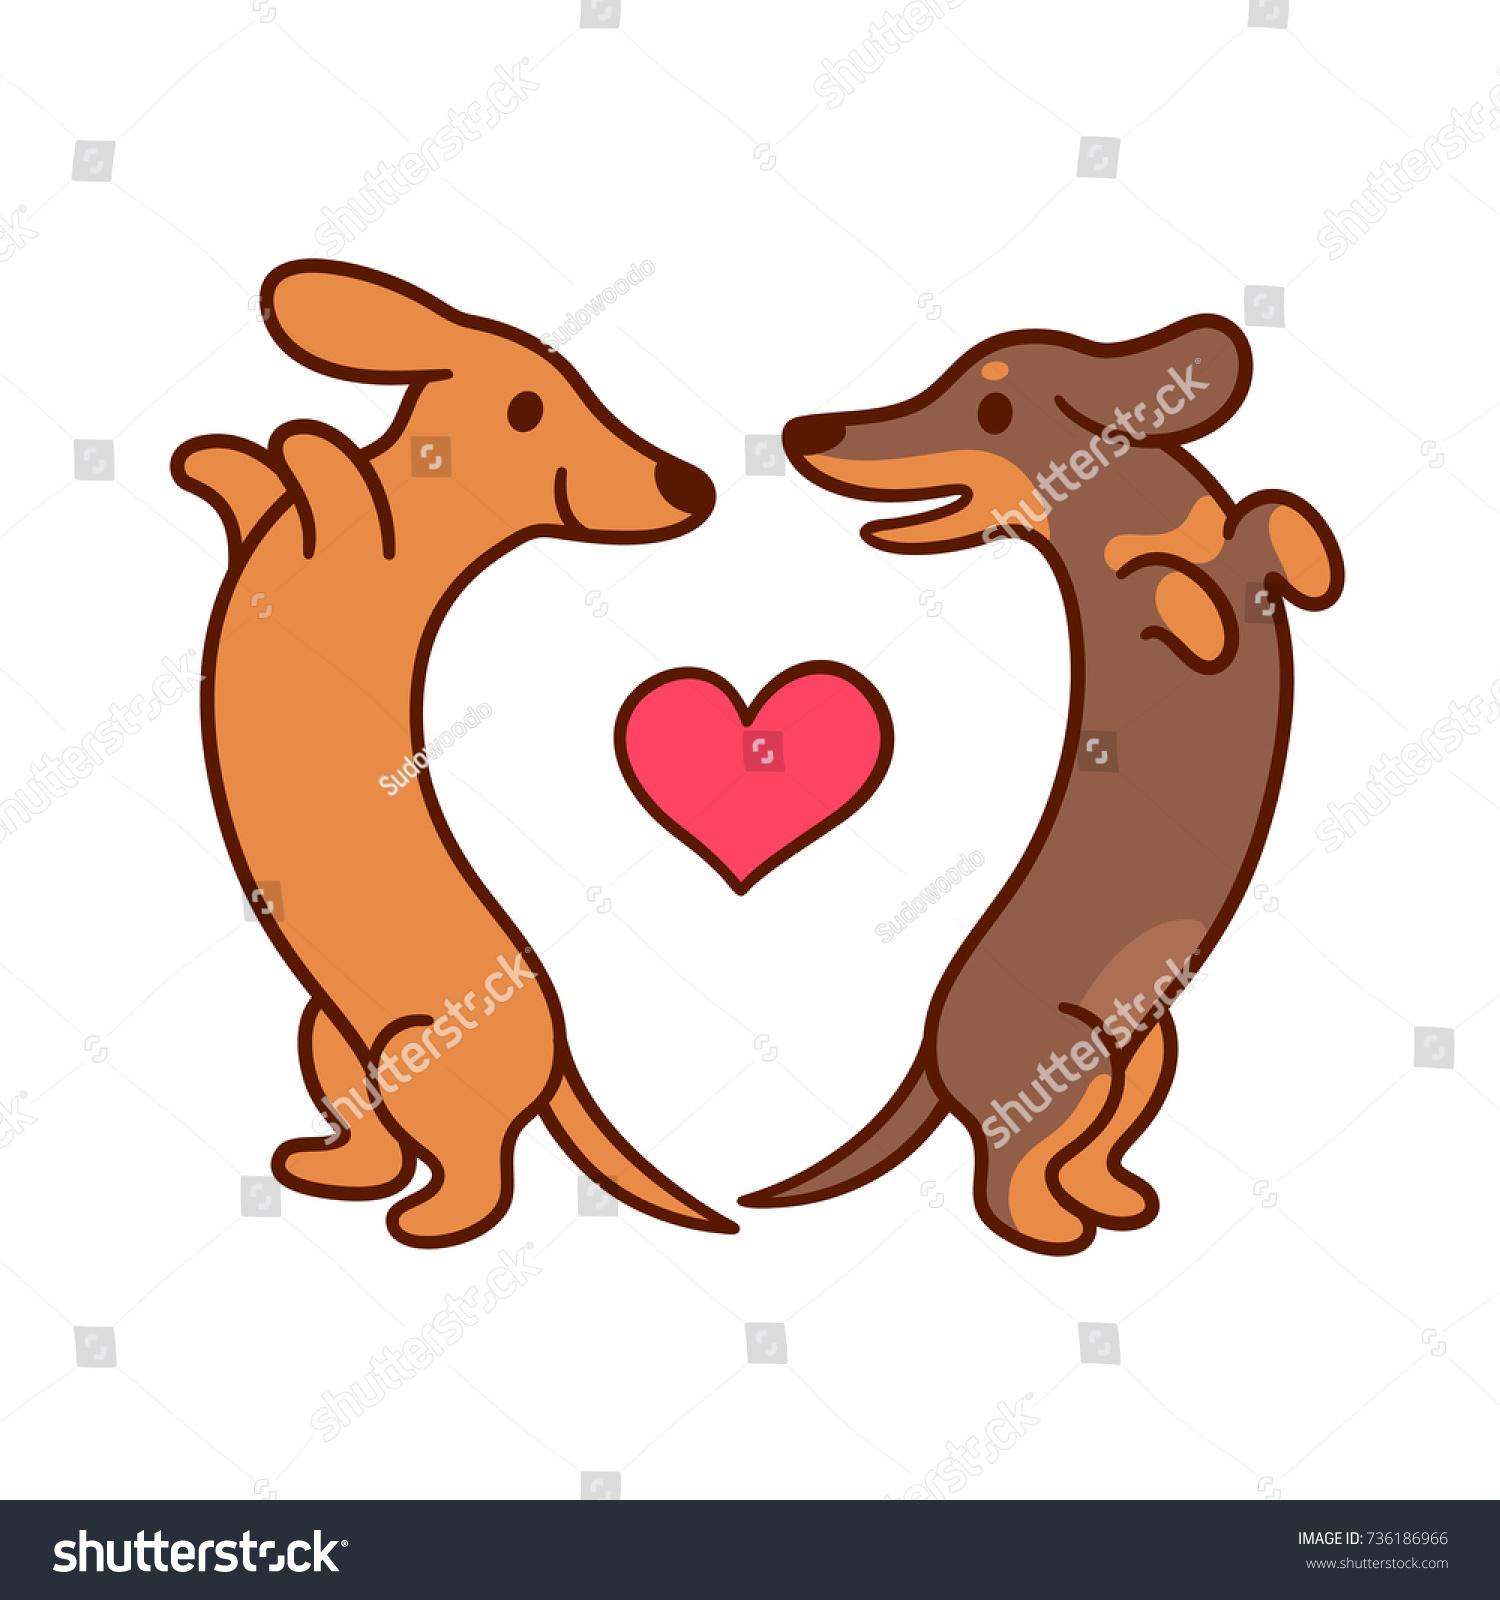 Love Each Other Cartoon: Cute Cartoon Dachshunds Love Adorable Wiener Stock Vector